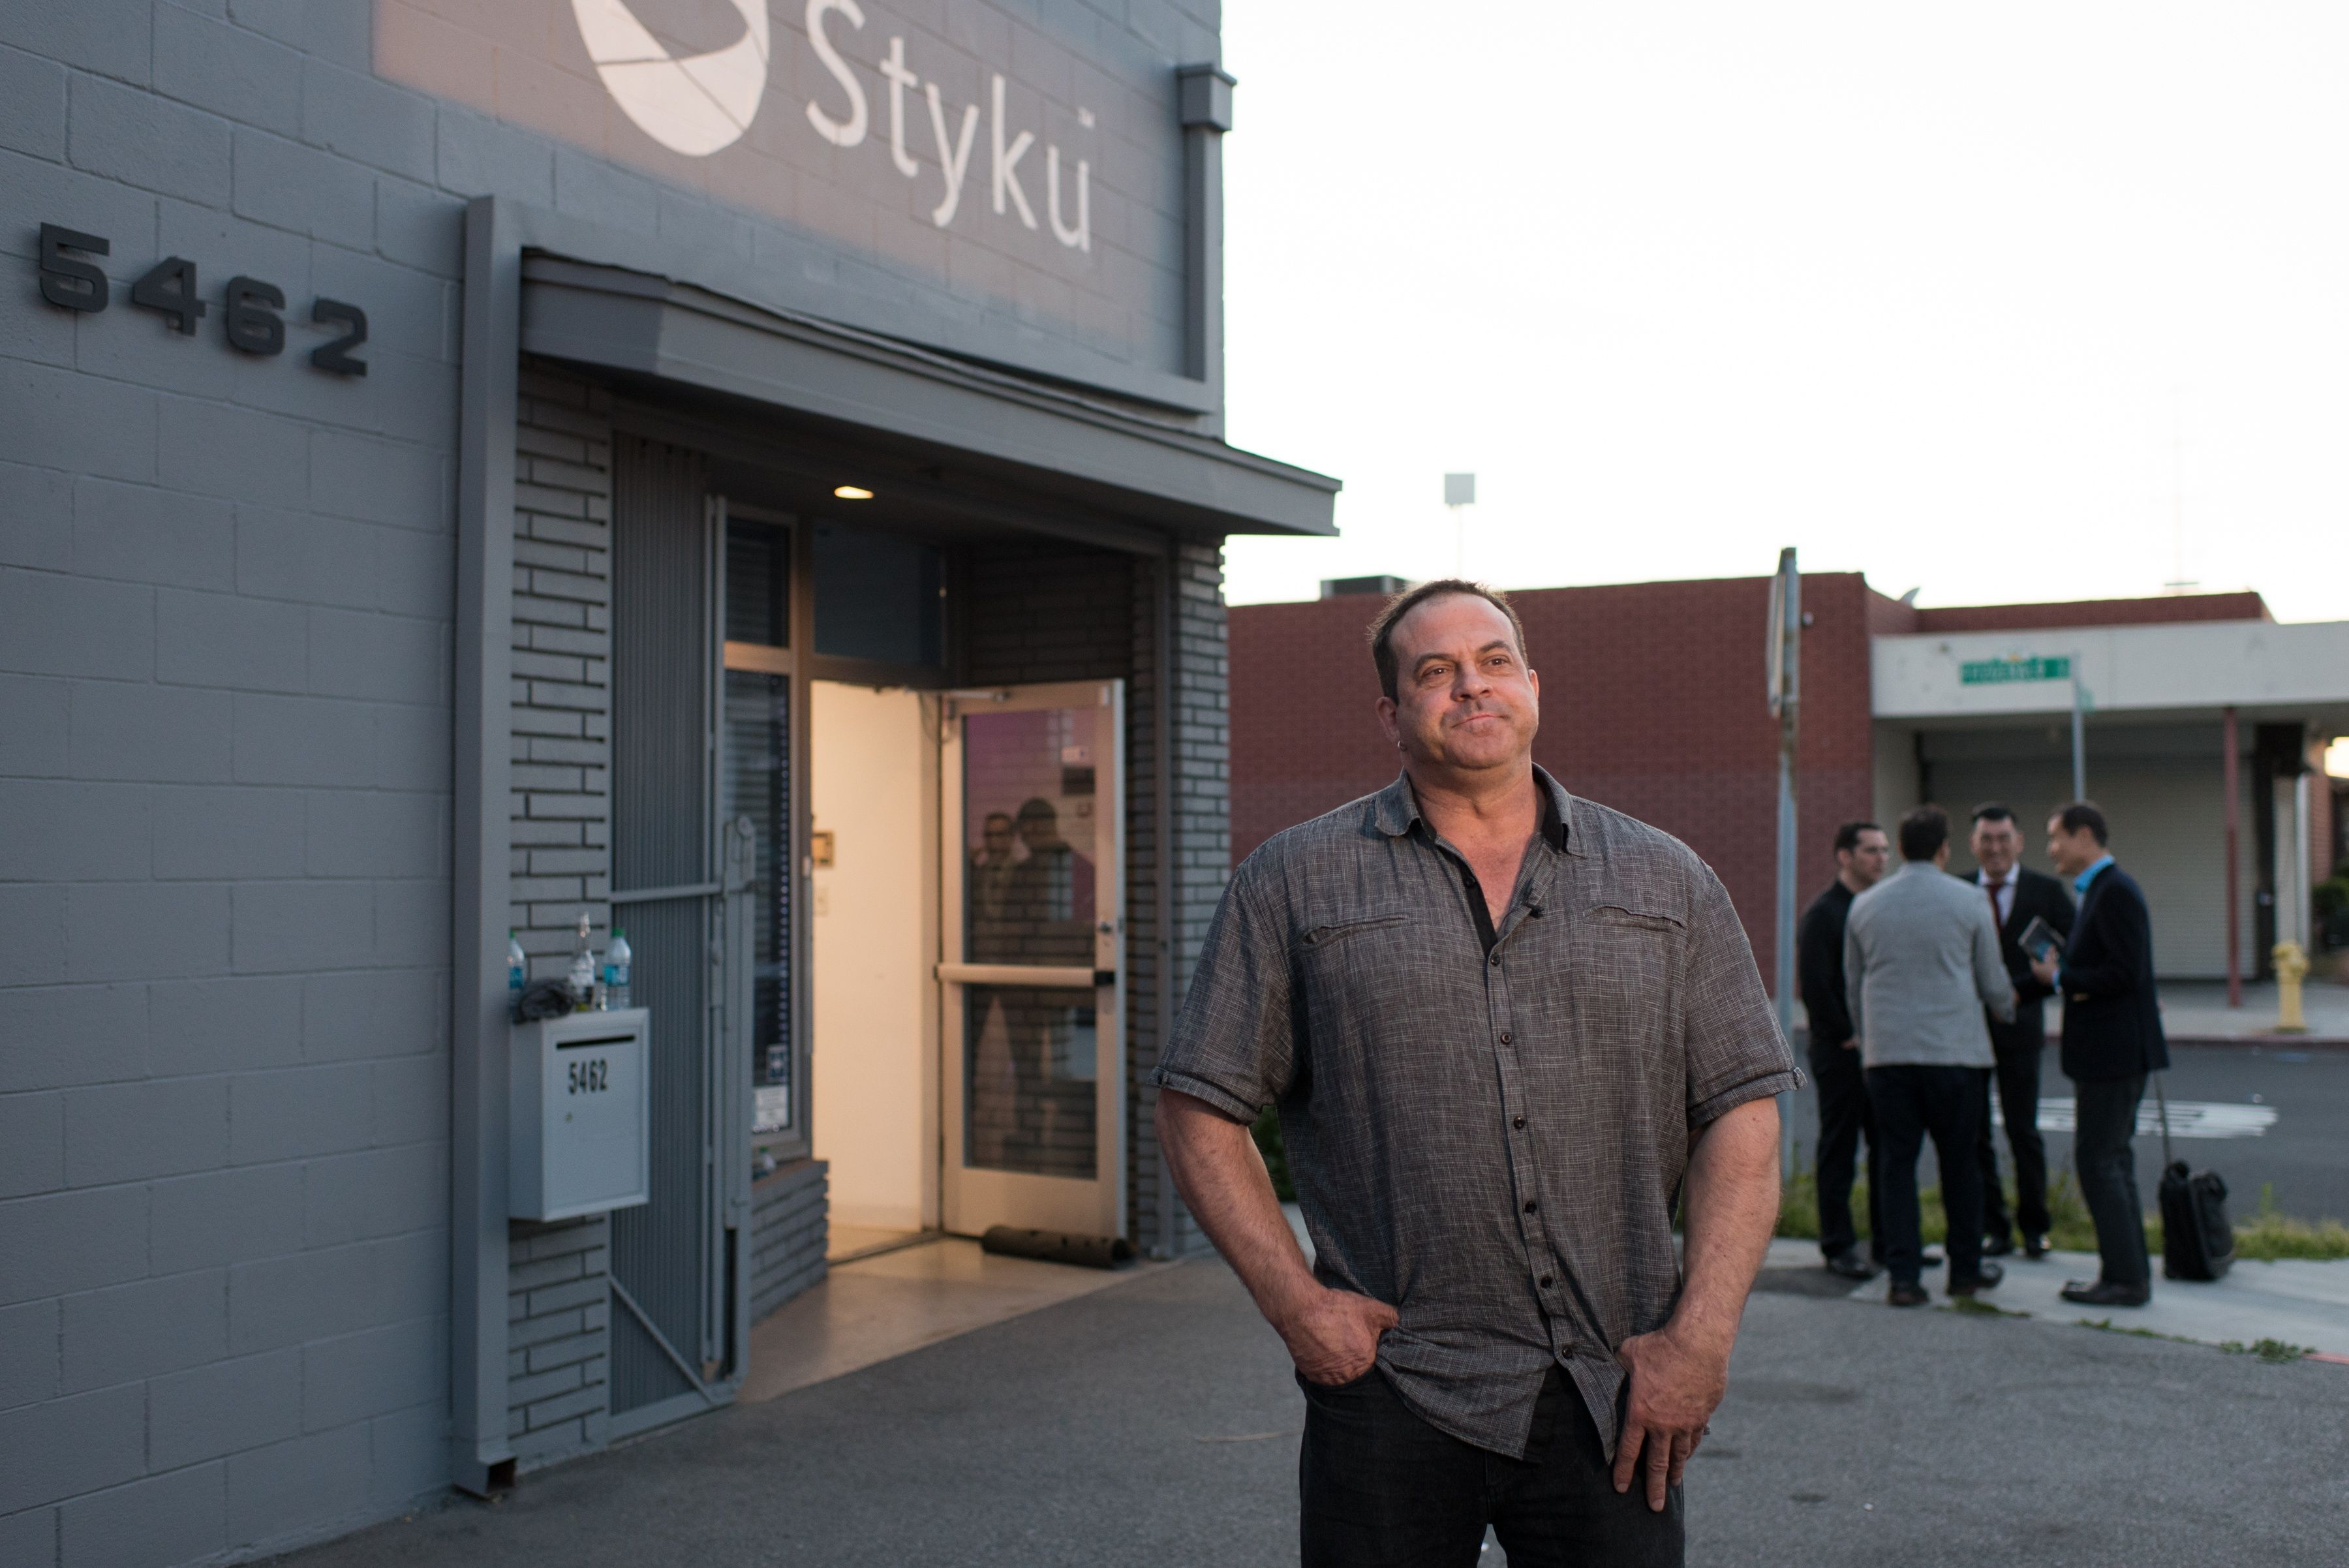 Grant Roberts with Styku sign.jpg